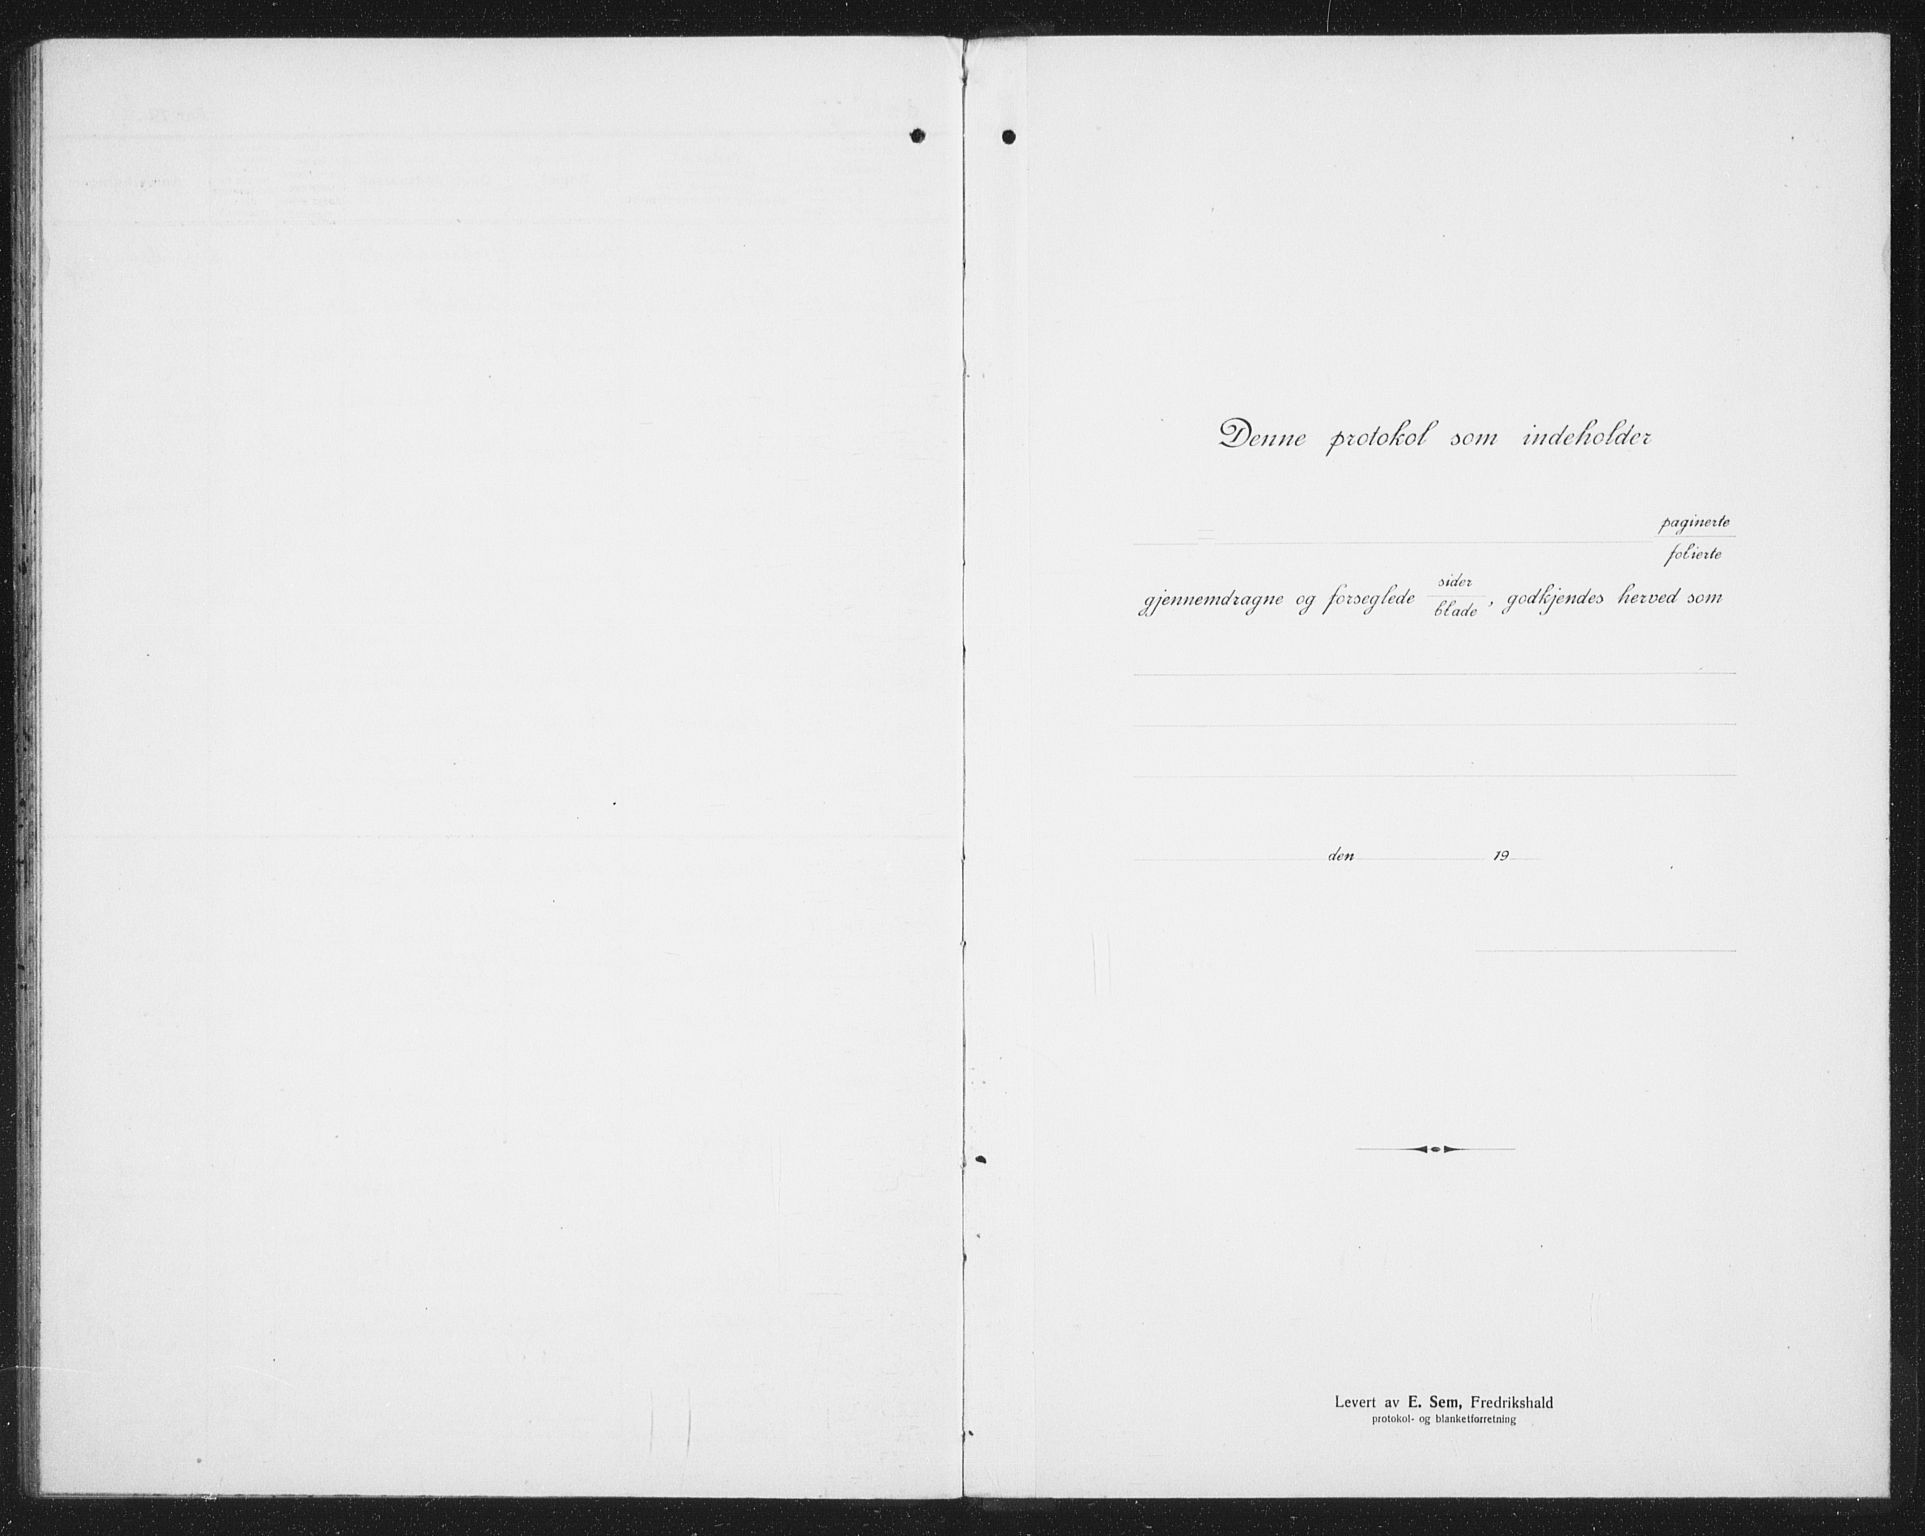 SAT, Ministerialprotokoller, klokkerbøker og fødselsregistre - Nordland, 874/L1083: Klokkerbok nr. 874C12, 1920-1936